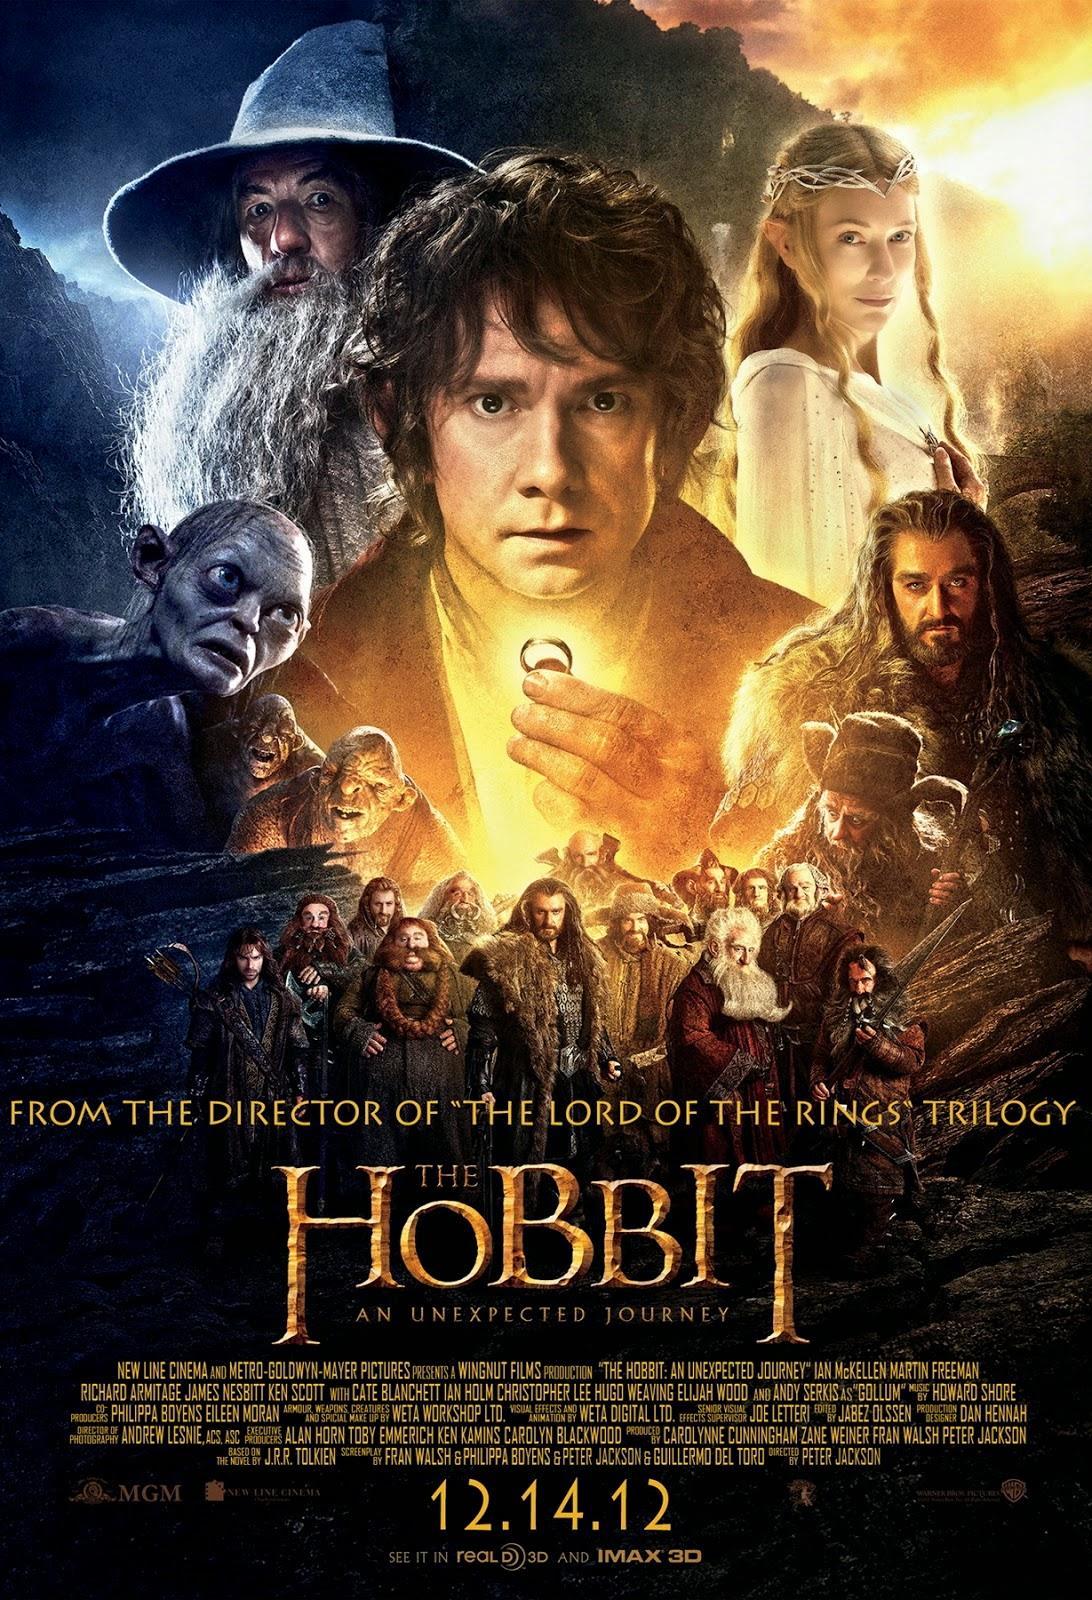 THE HOBBIT AN UNEXPECTED JOURNEY เดอะฮอบบิท การผจญภัยสุดคาดคิด  2012 FULL HD master มาสเตอร์ พากย์ไทย